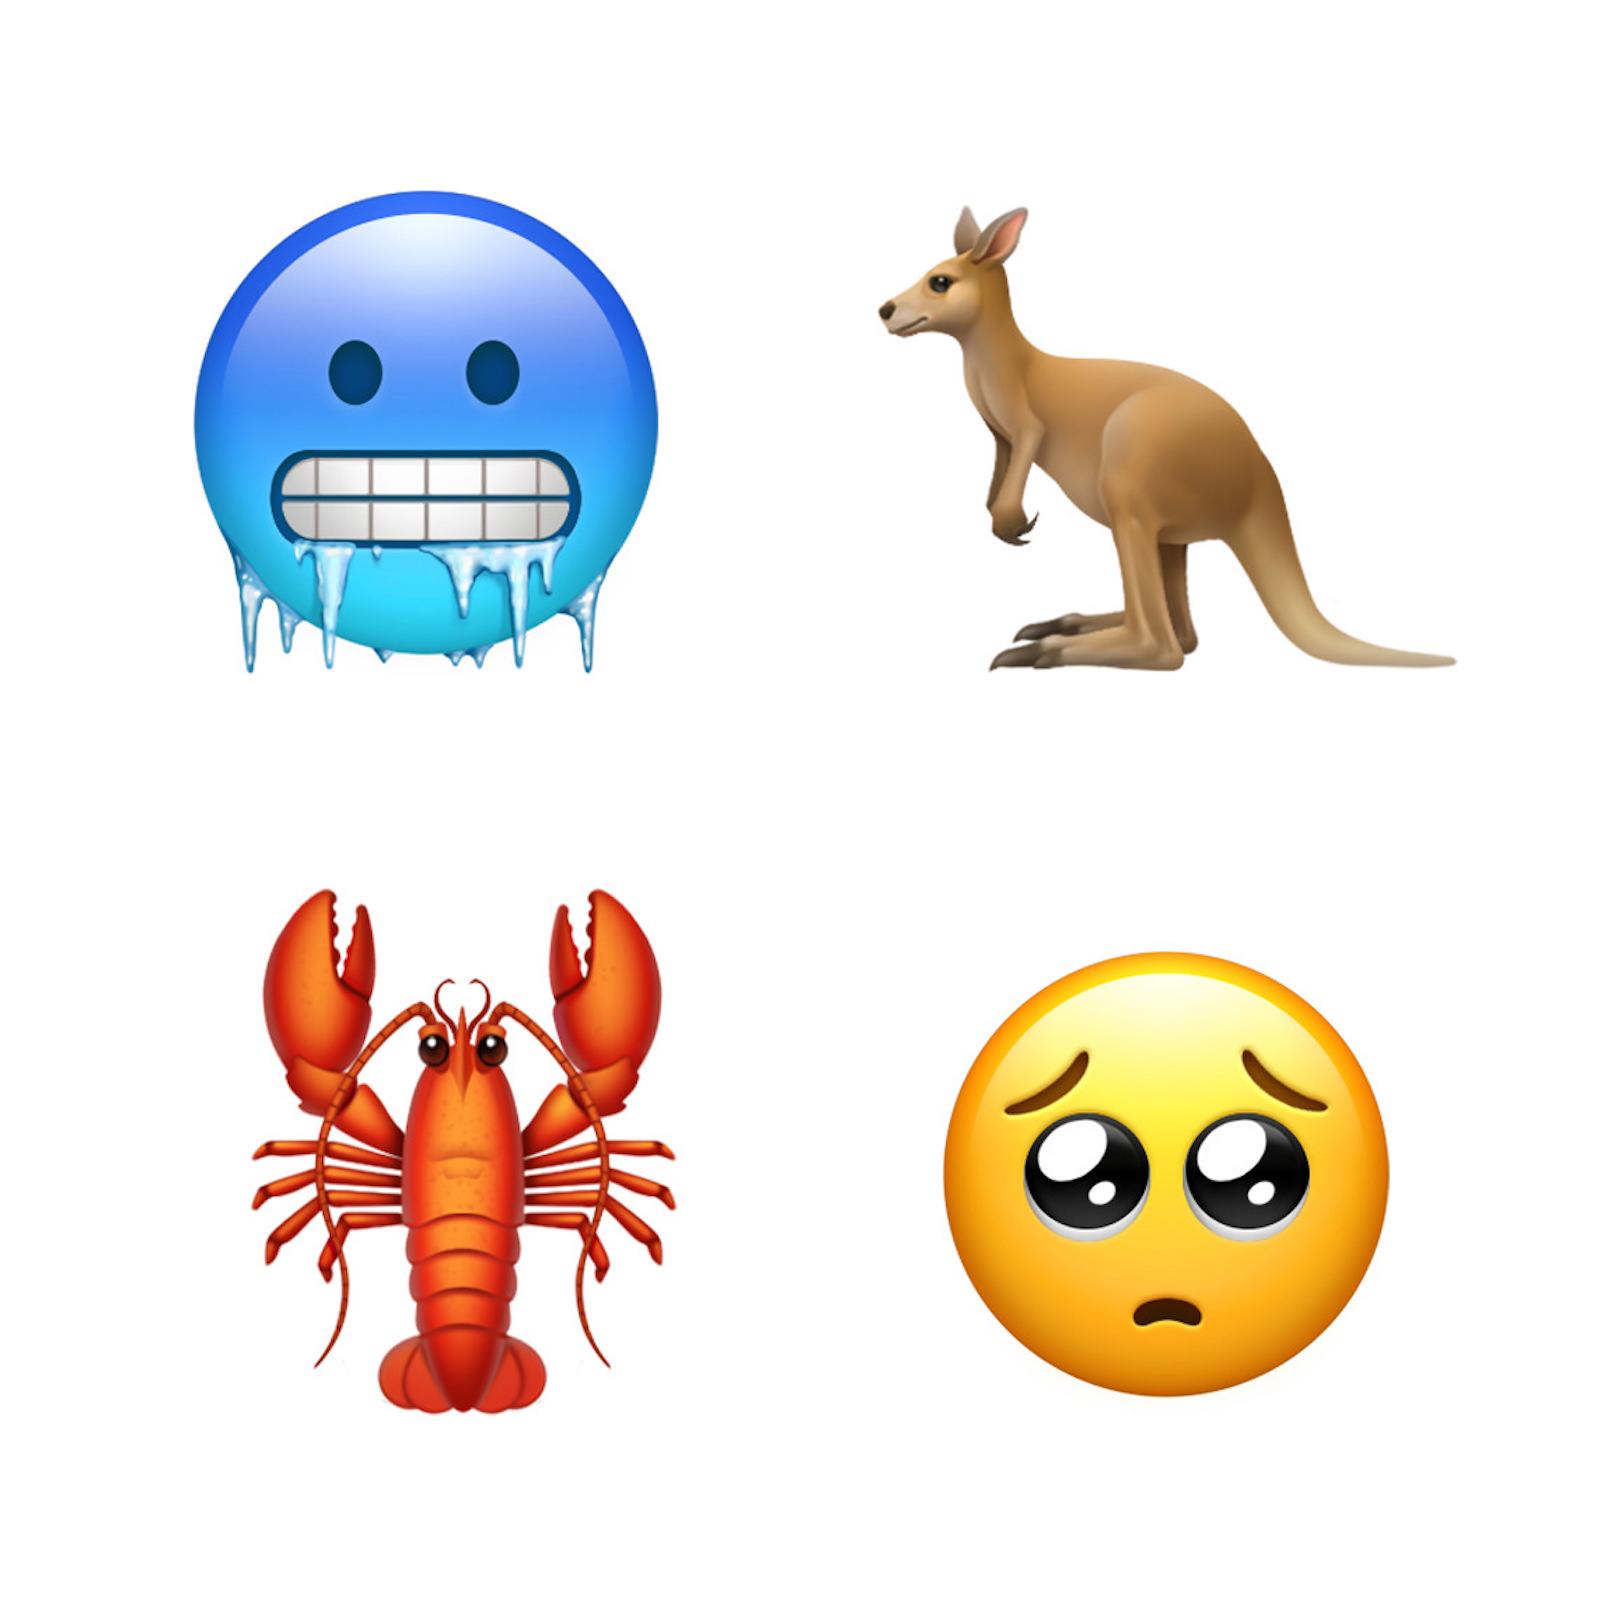 ios-121-emoji-update-cold-kangaroo-lobster-sad-10012018.jpg